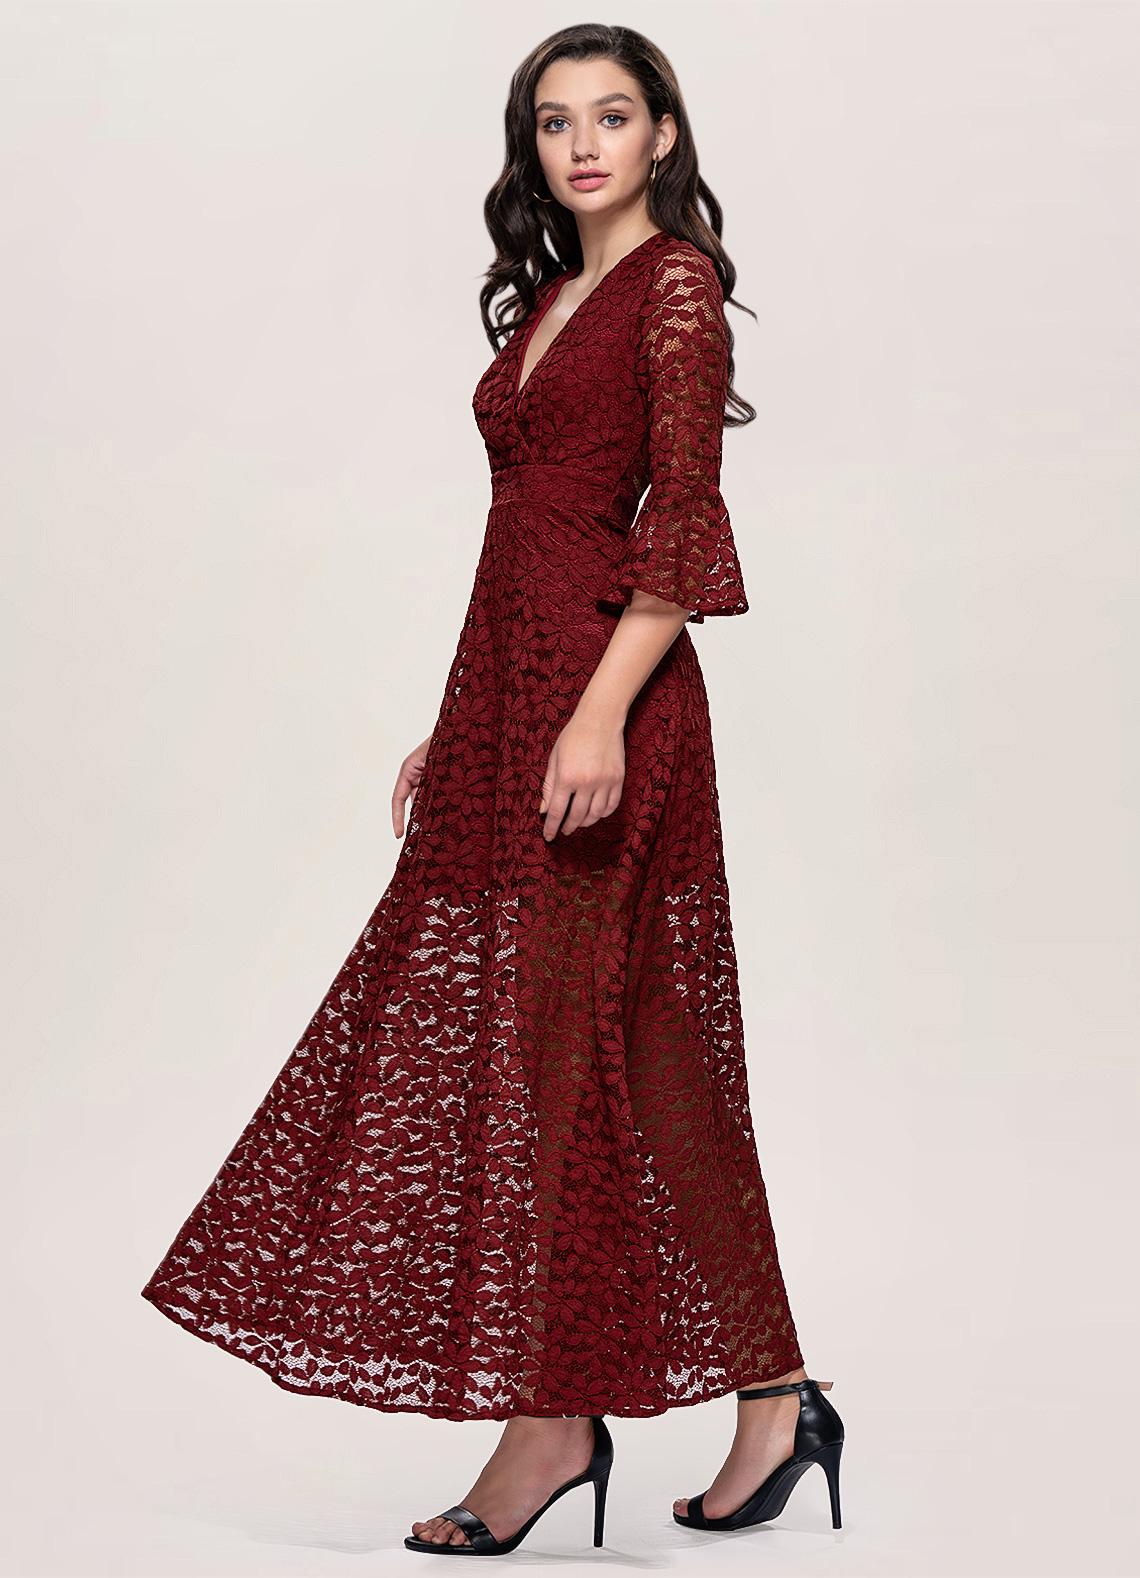 Dusk Burgundy Maxi Dress